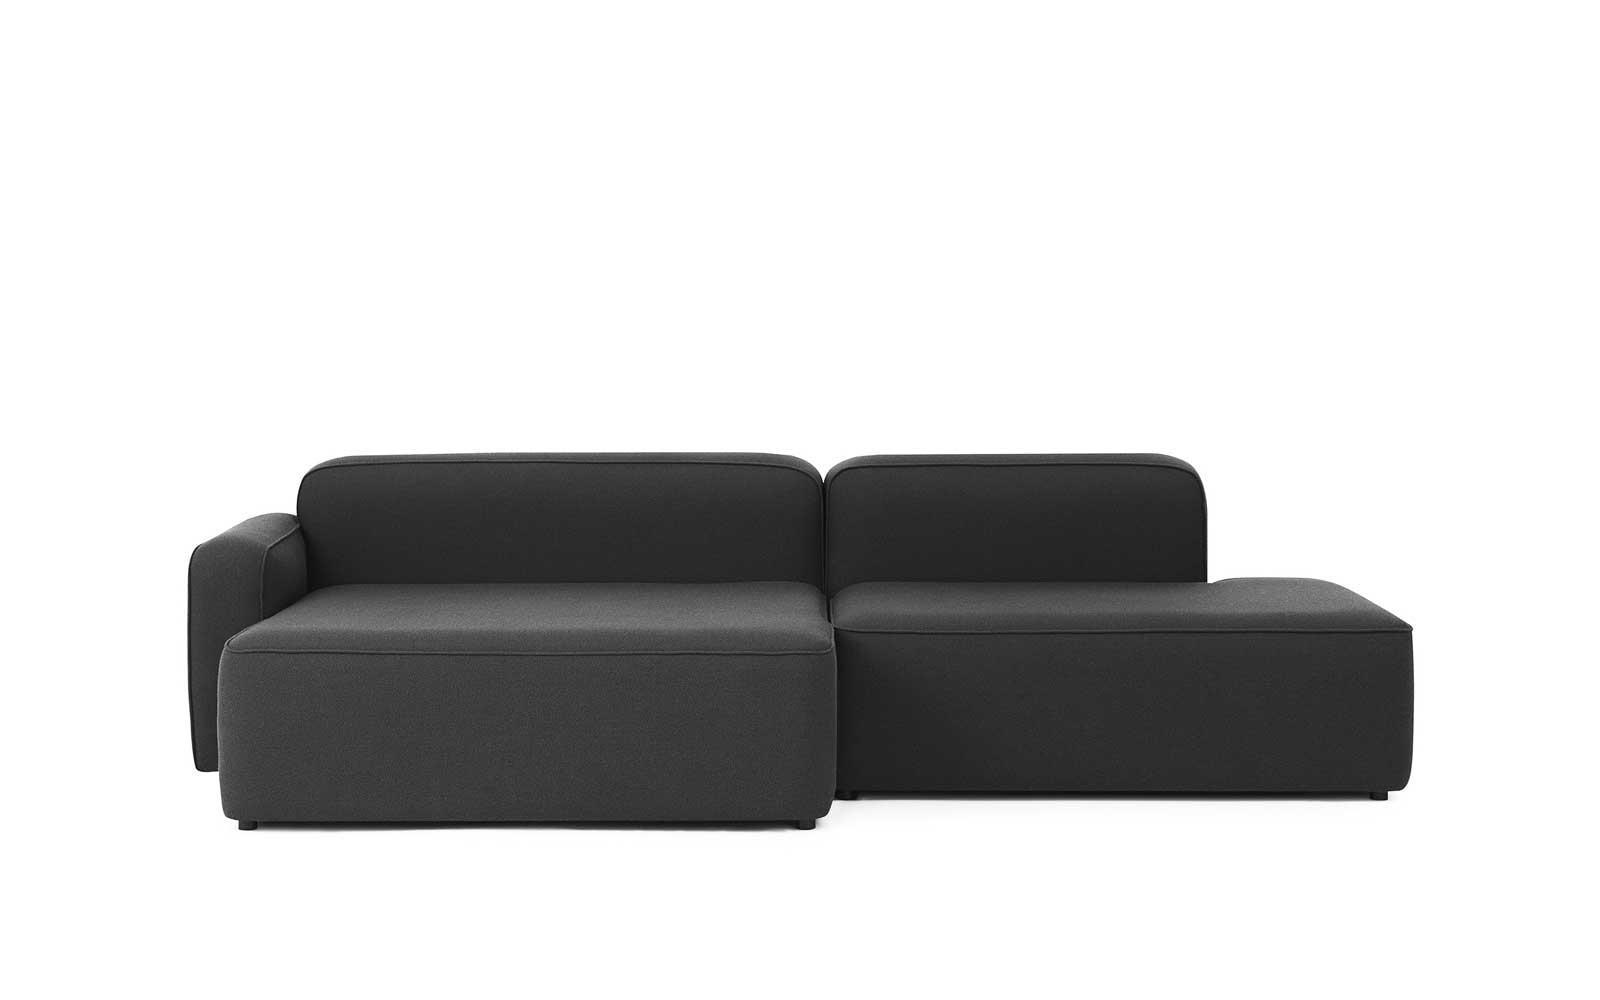 sofa shampoo wash hyderabad sectional sofas in dallas contemporary furniture clean minimalistic design